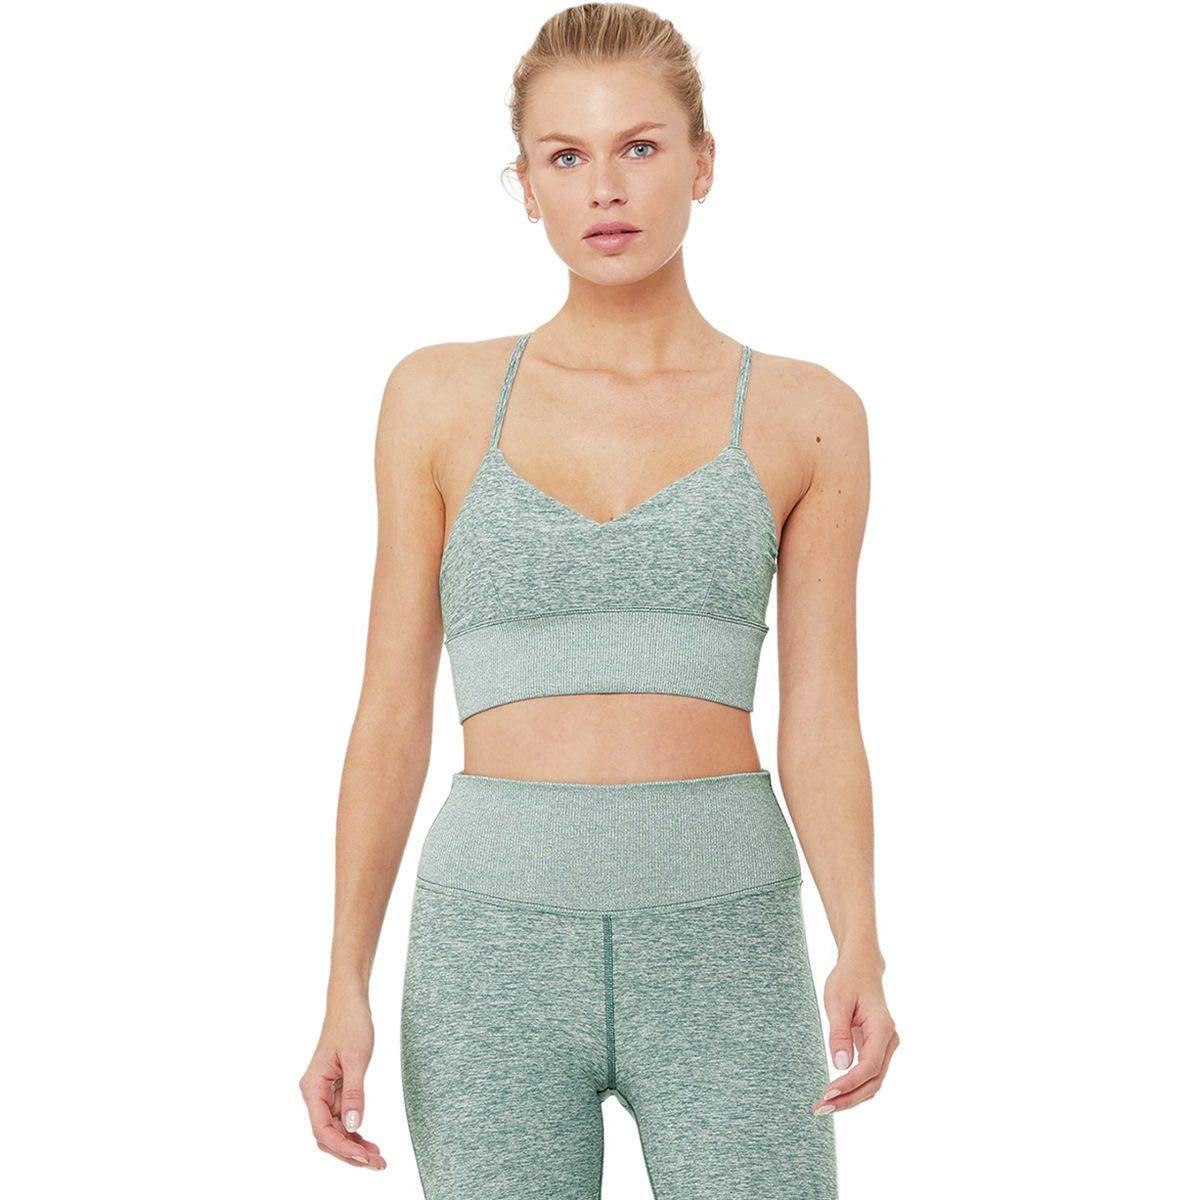 d50d177348f87 Alo Yoga Alosoft Lush Bra - Women s Seagrass Heather